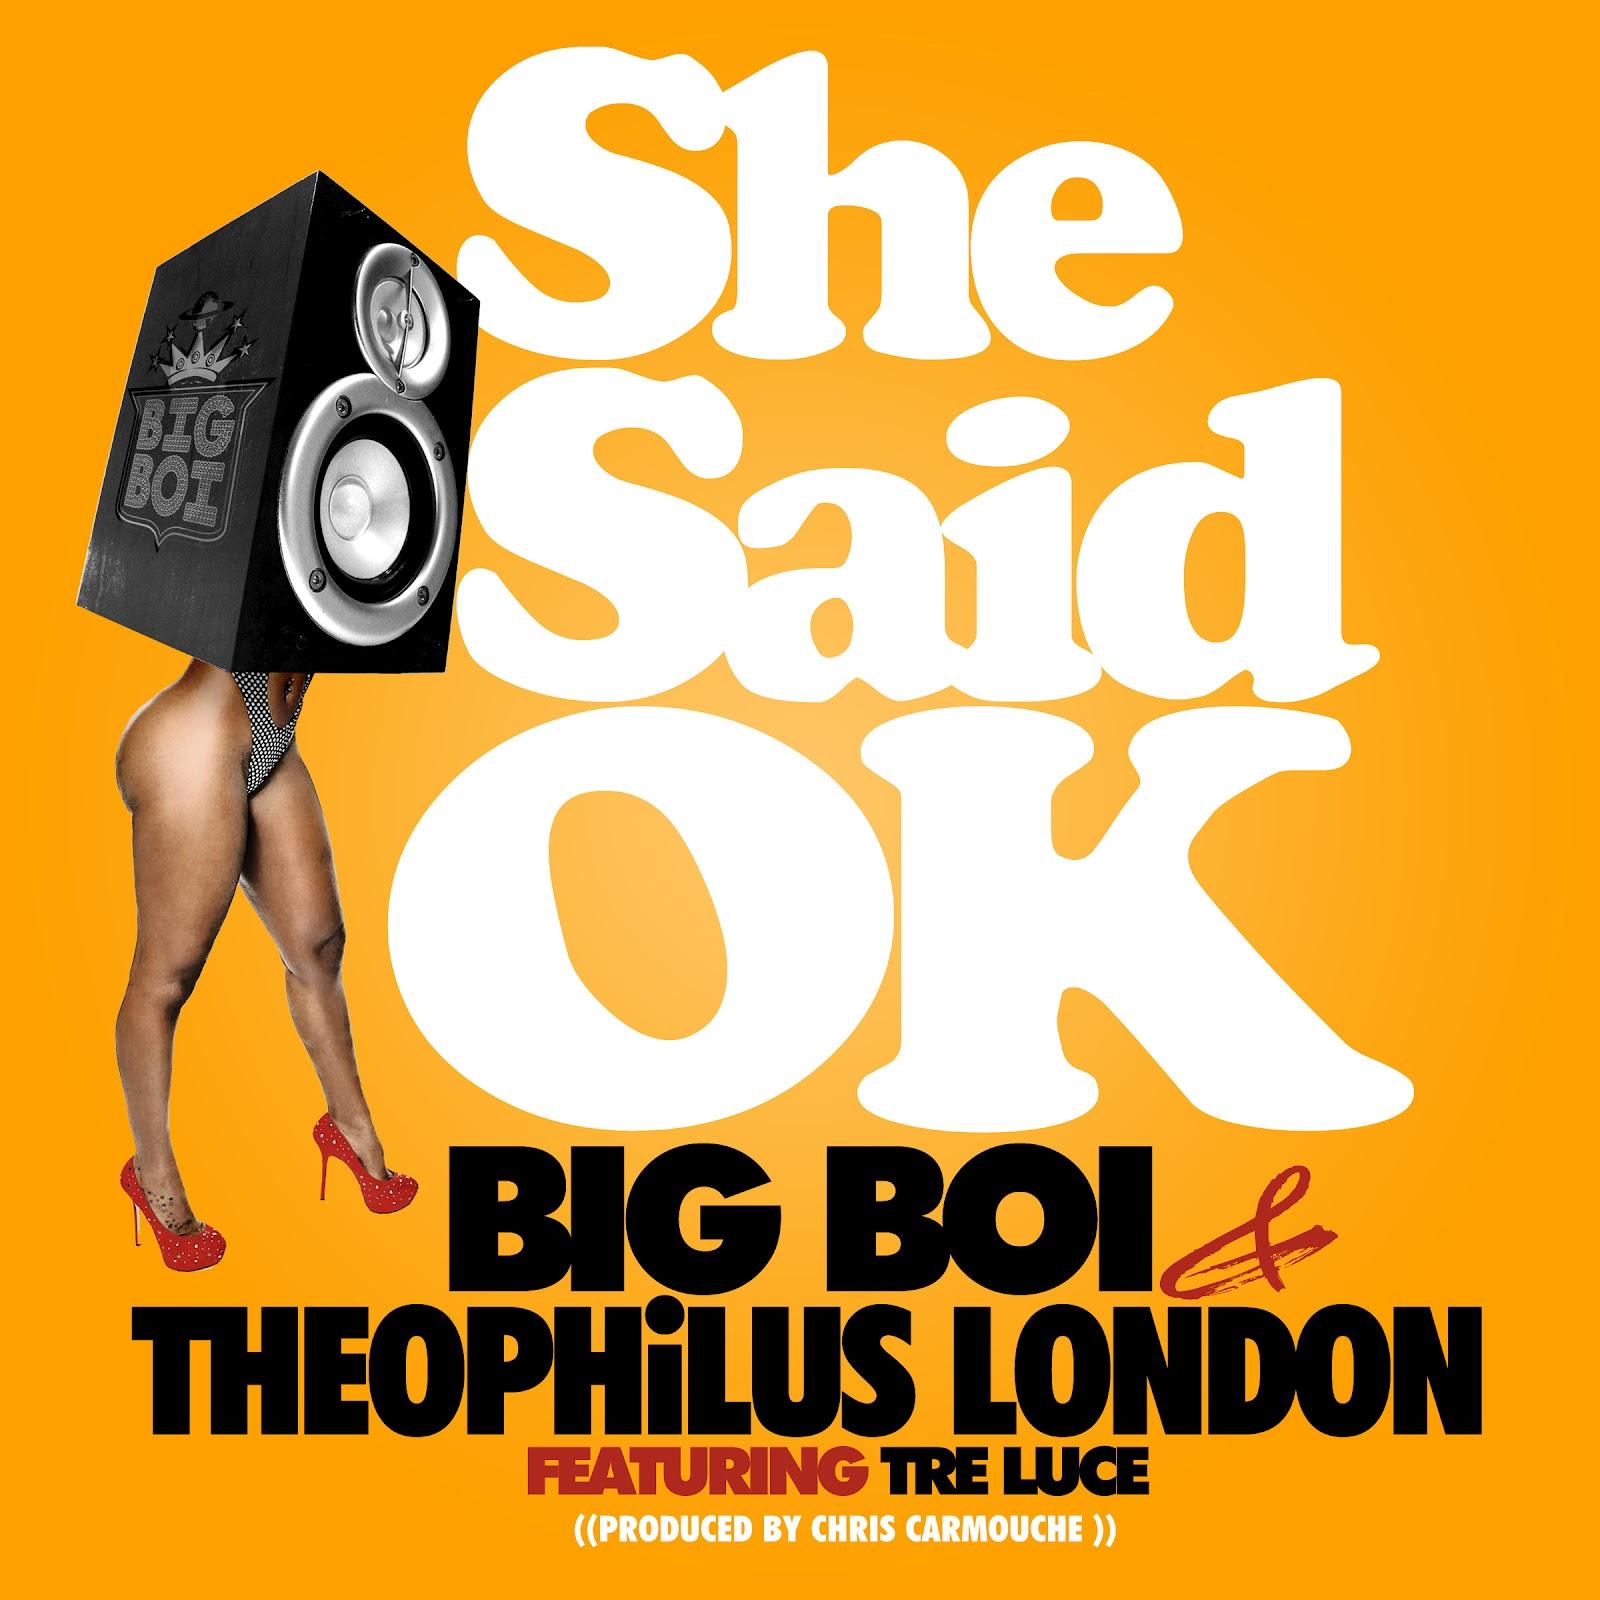 http://1.bp.blogspot.com/-G5Cxec3D3qo/T8YivLw-B-I/AAAAAAAACHk/lOw9VmM1org/s1600/big-boi-amp-theophilus-london-featuring-tre-luce-she-said-ok-01.jpg